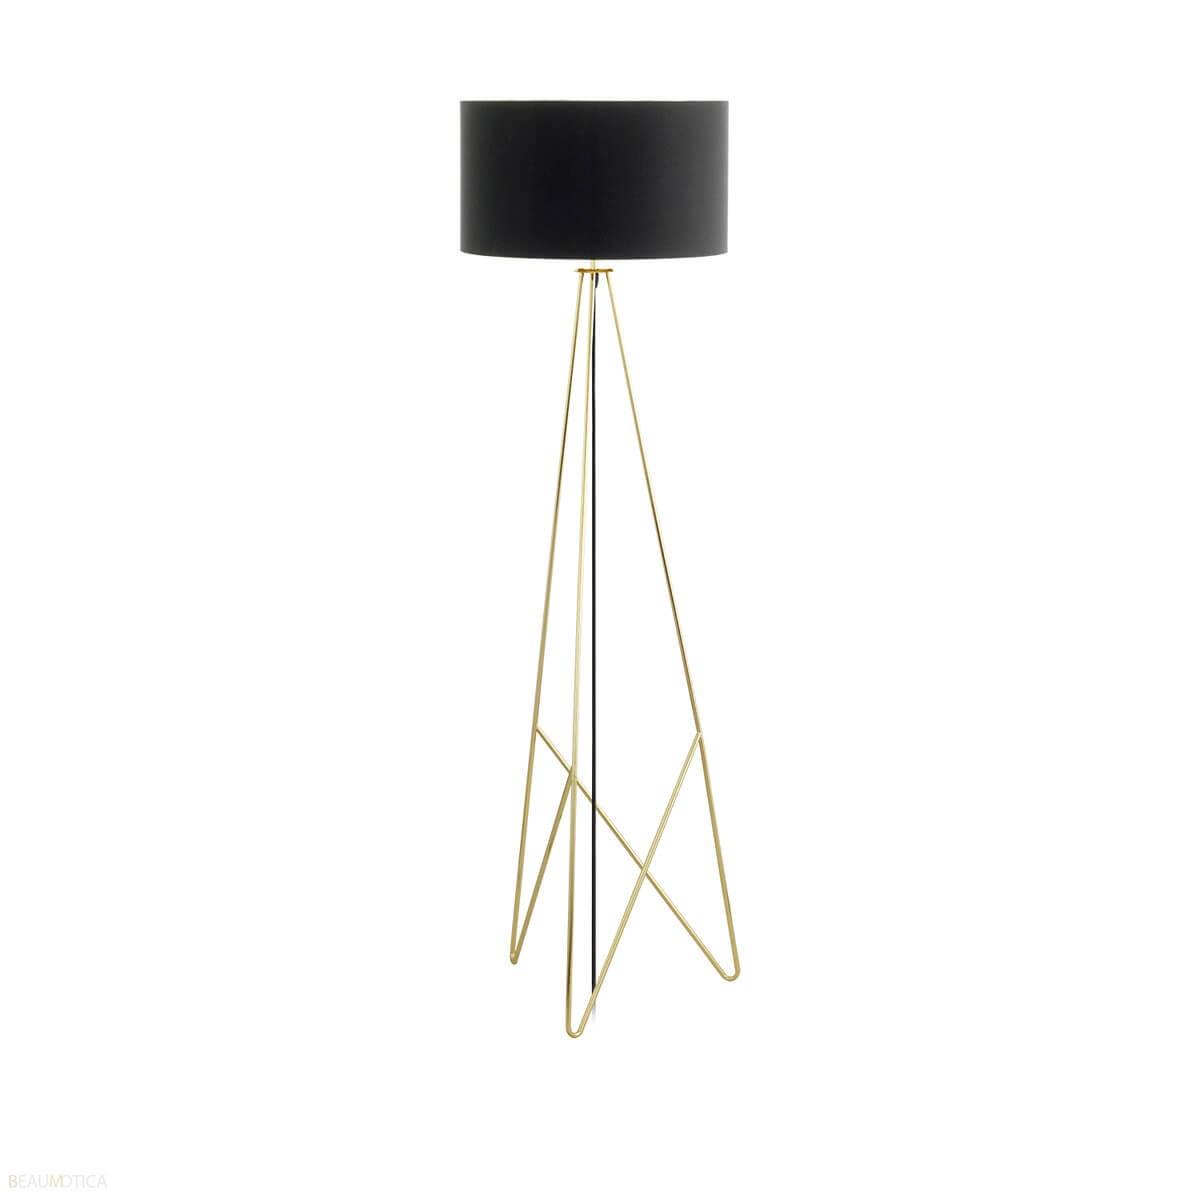 Vaak Eglo Camporale Vloerlamp Zwart, Goud, Messing (ø45cm) UM68